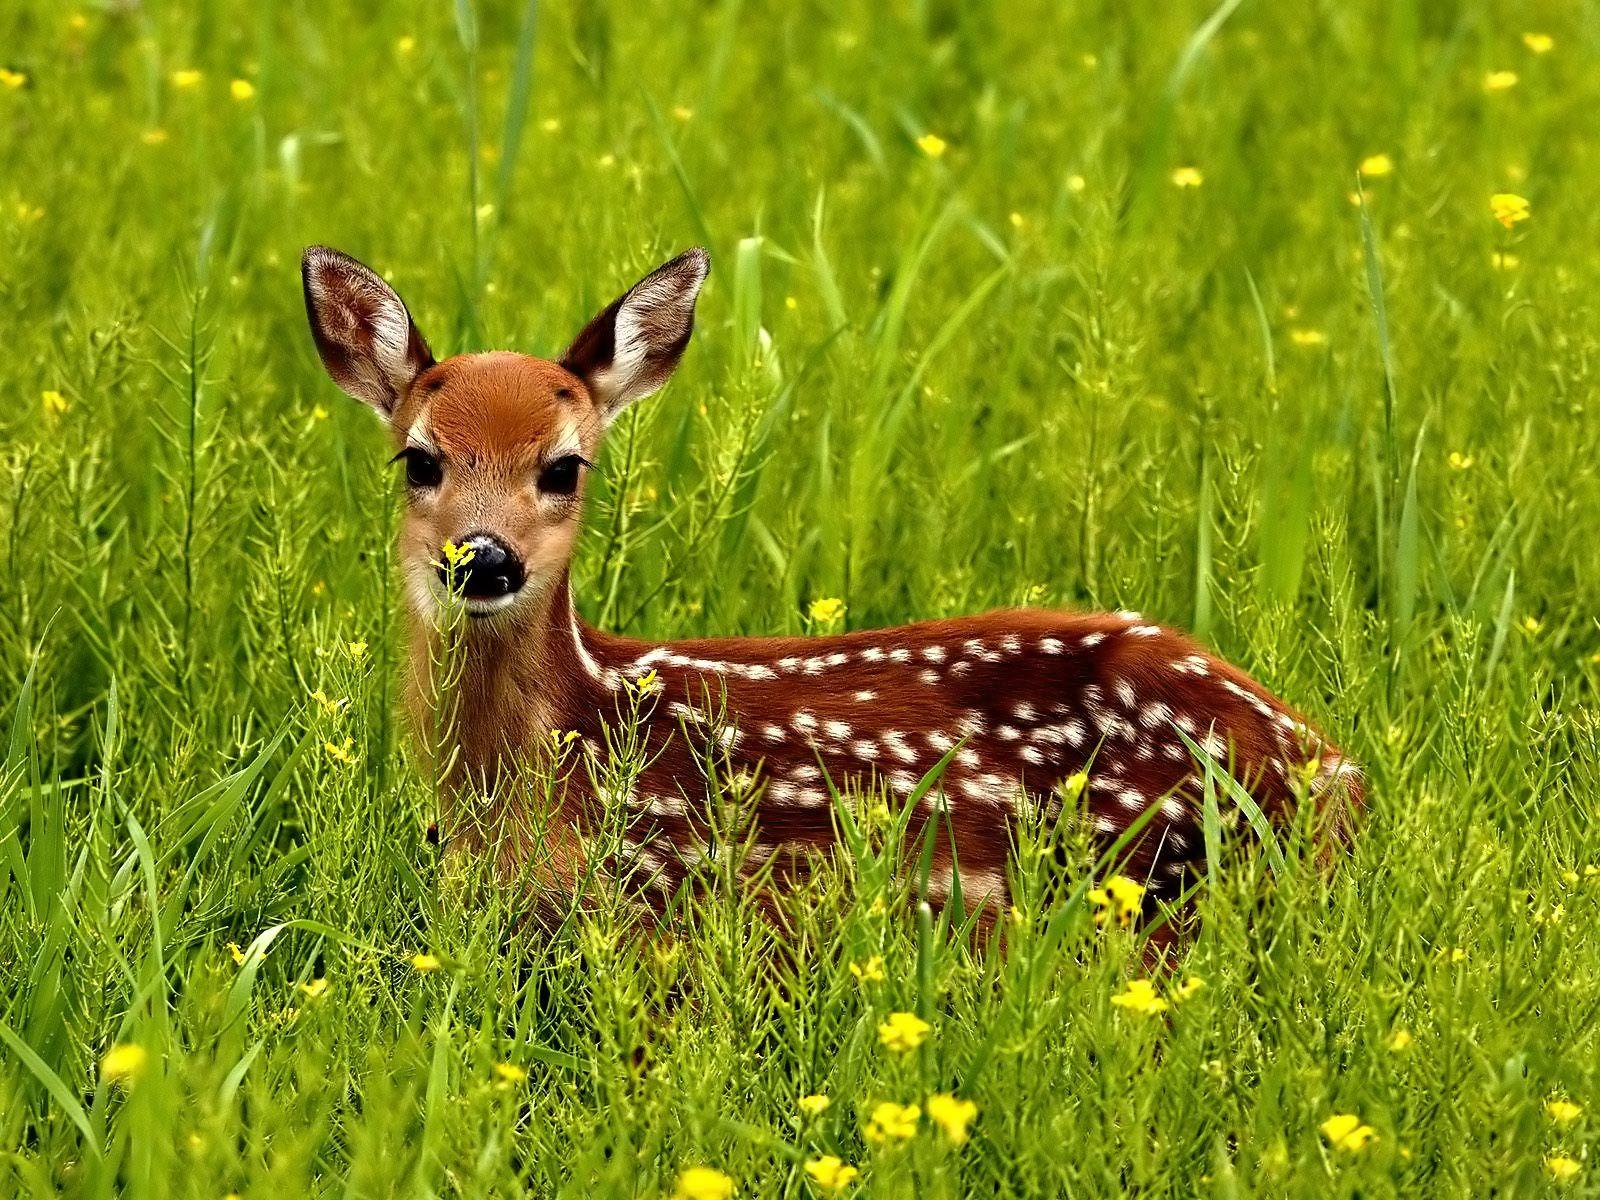 Indian Deer in Lovely Flowers Microsoft Windows 8